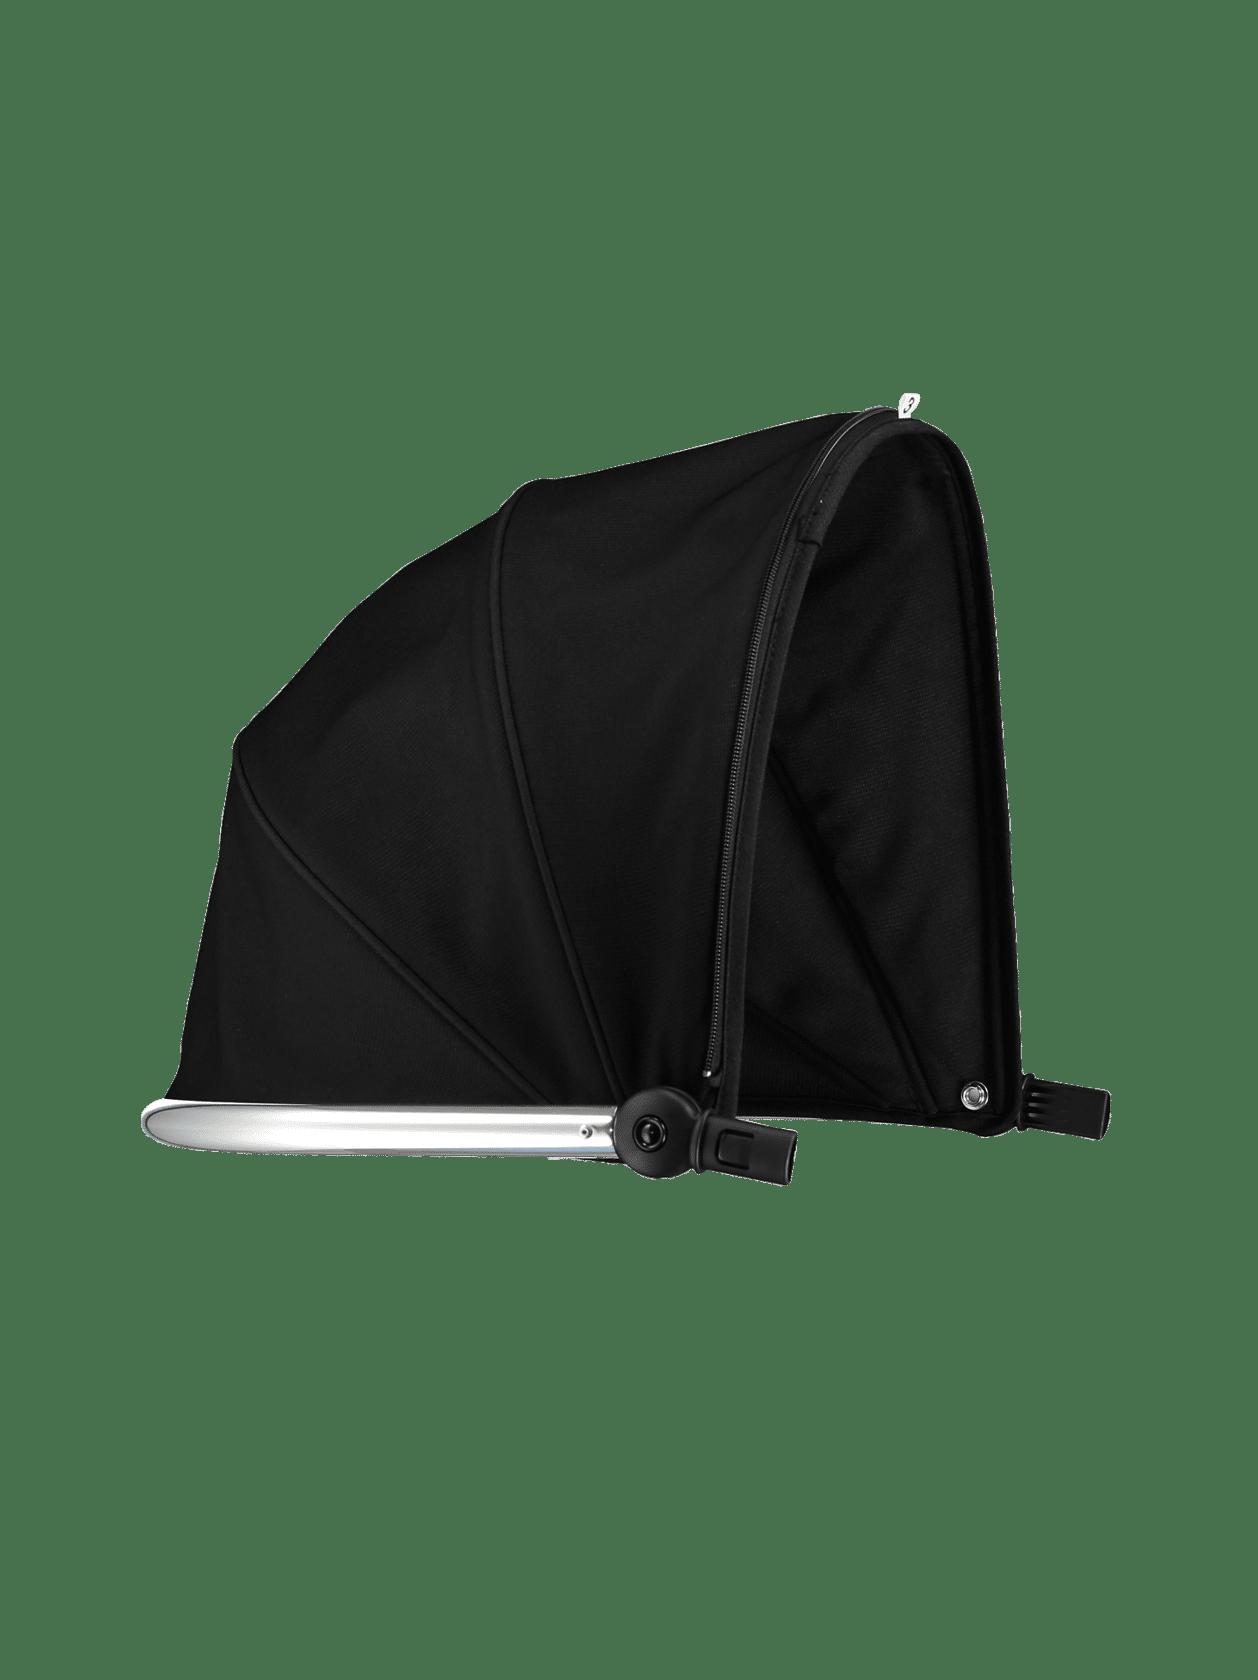 Peach Lower Seat Hood - Black Magic